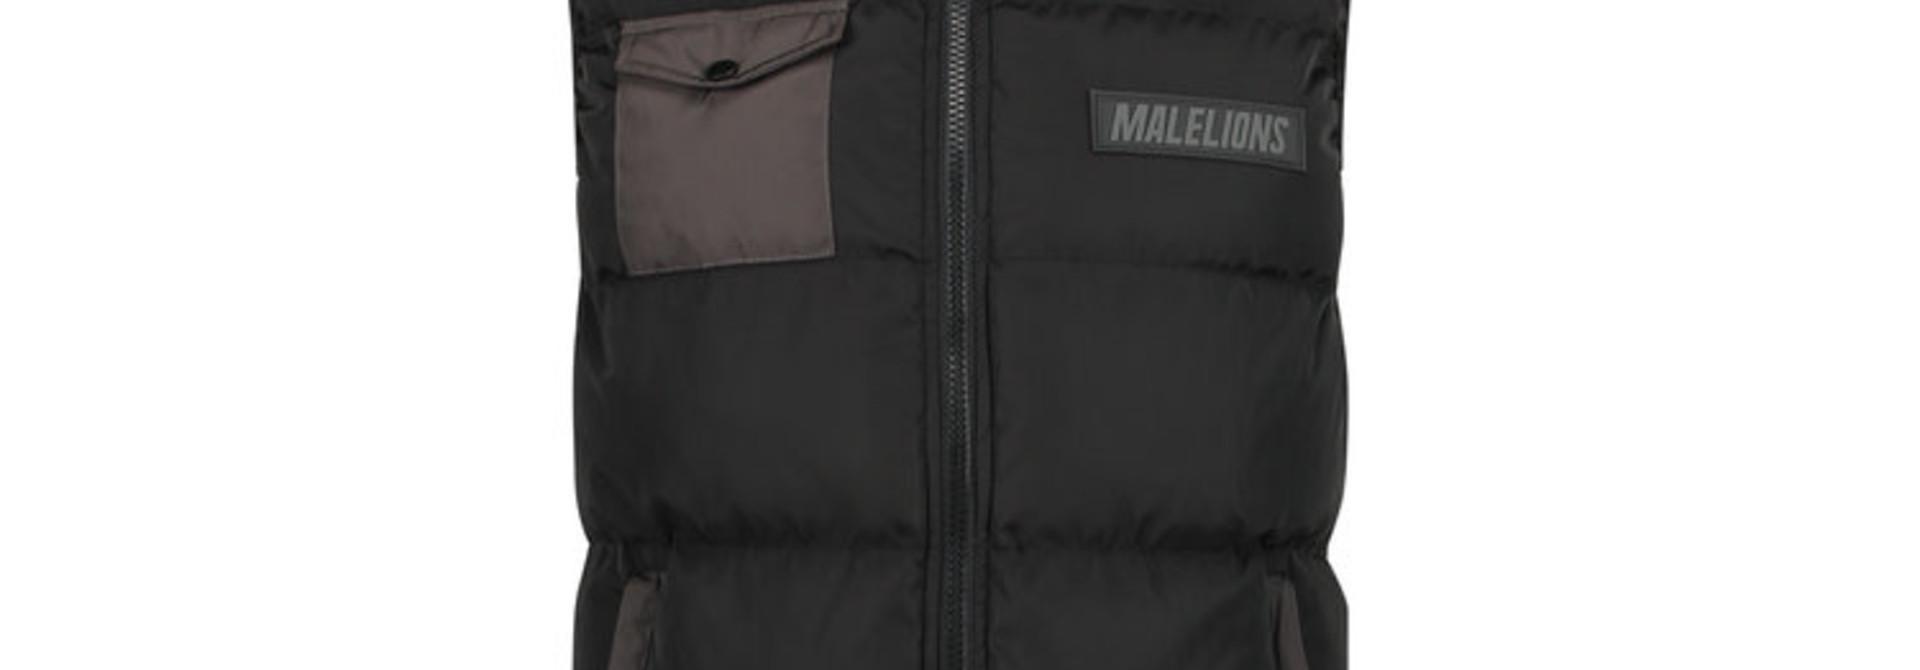 Malelions pocket bodywarmer Black/Antra